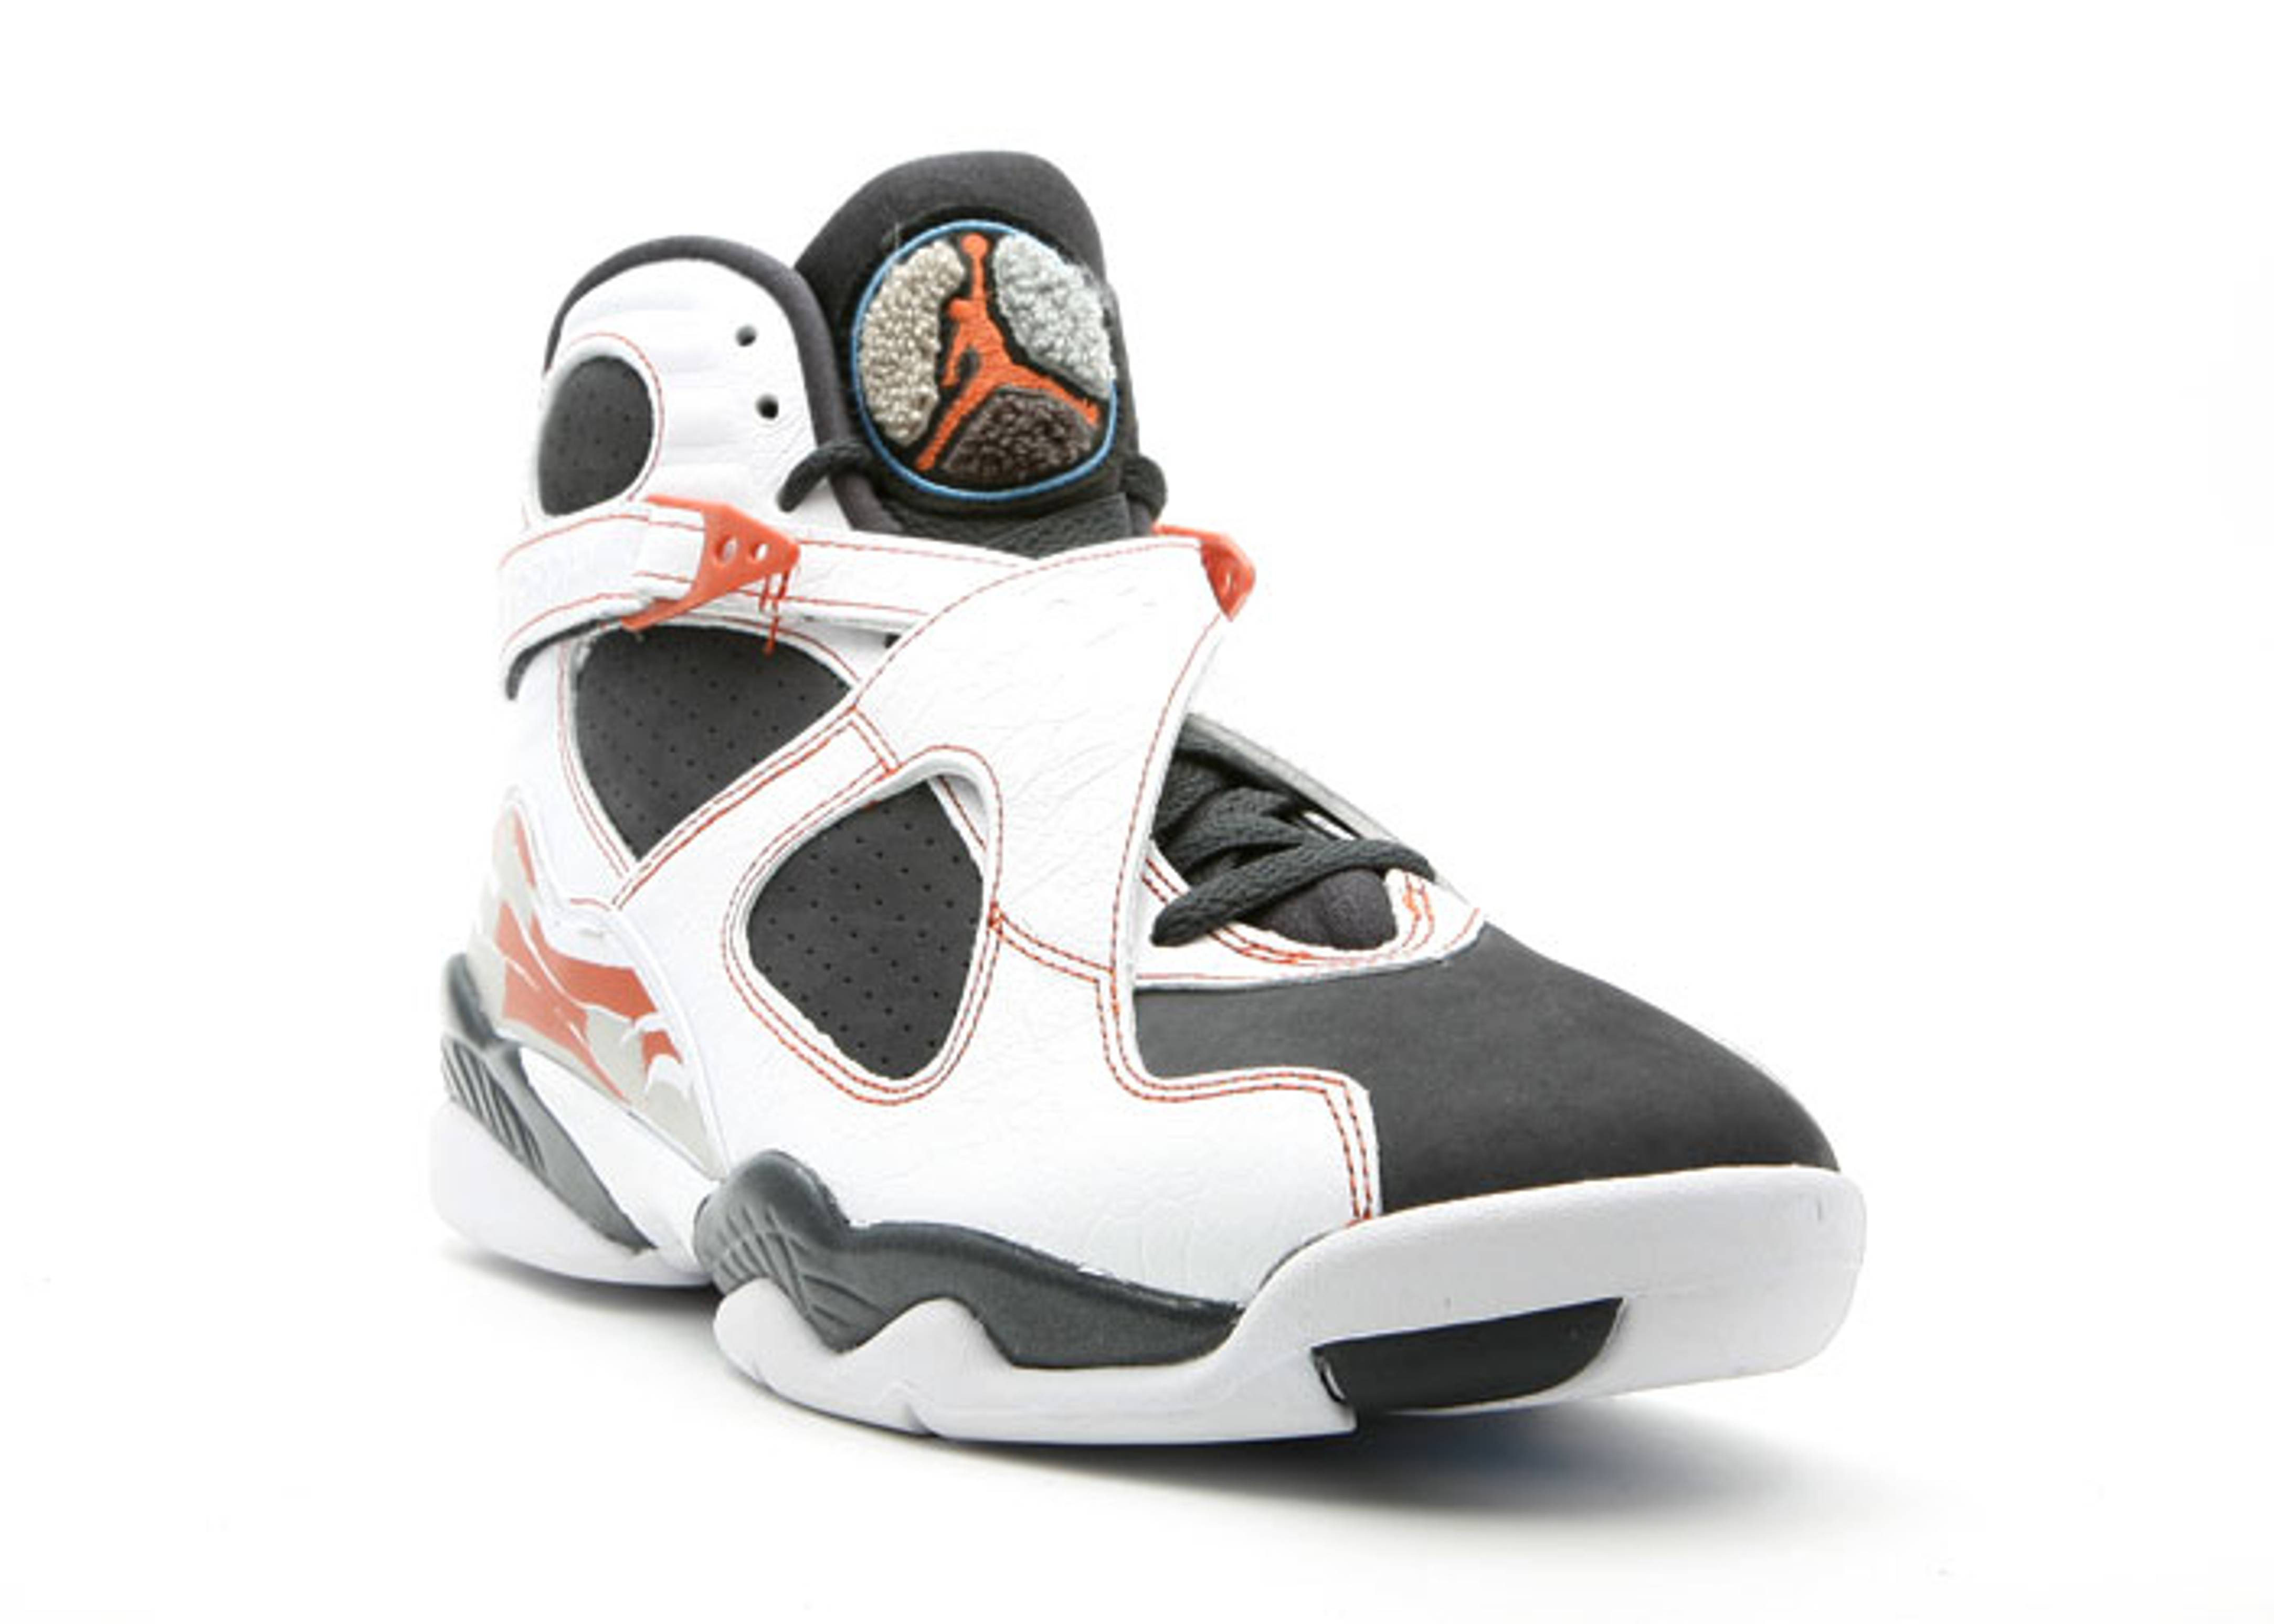 Nike Air Jordan 8 Retro LS - 317258-104 - Size 10 - fxLrLl7v